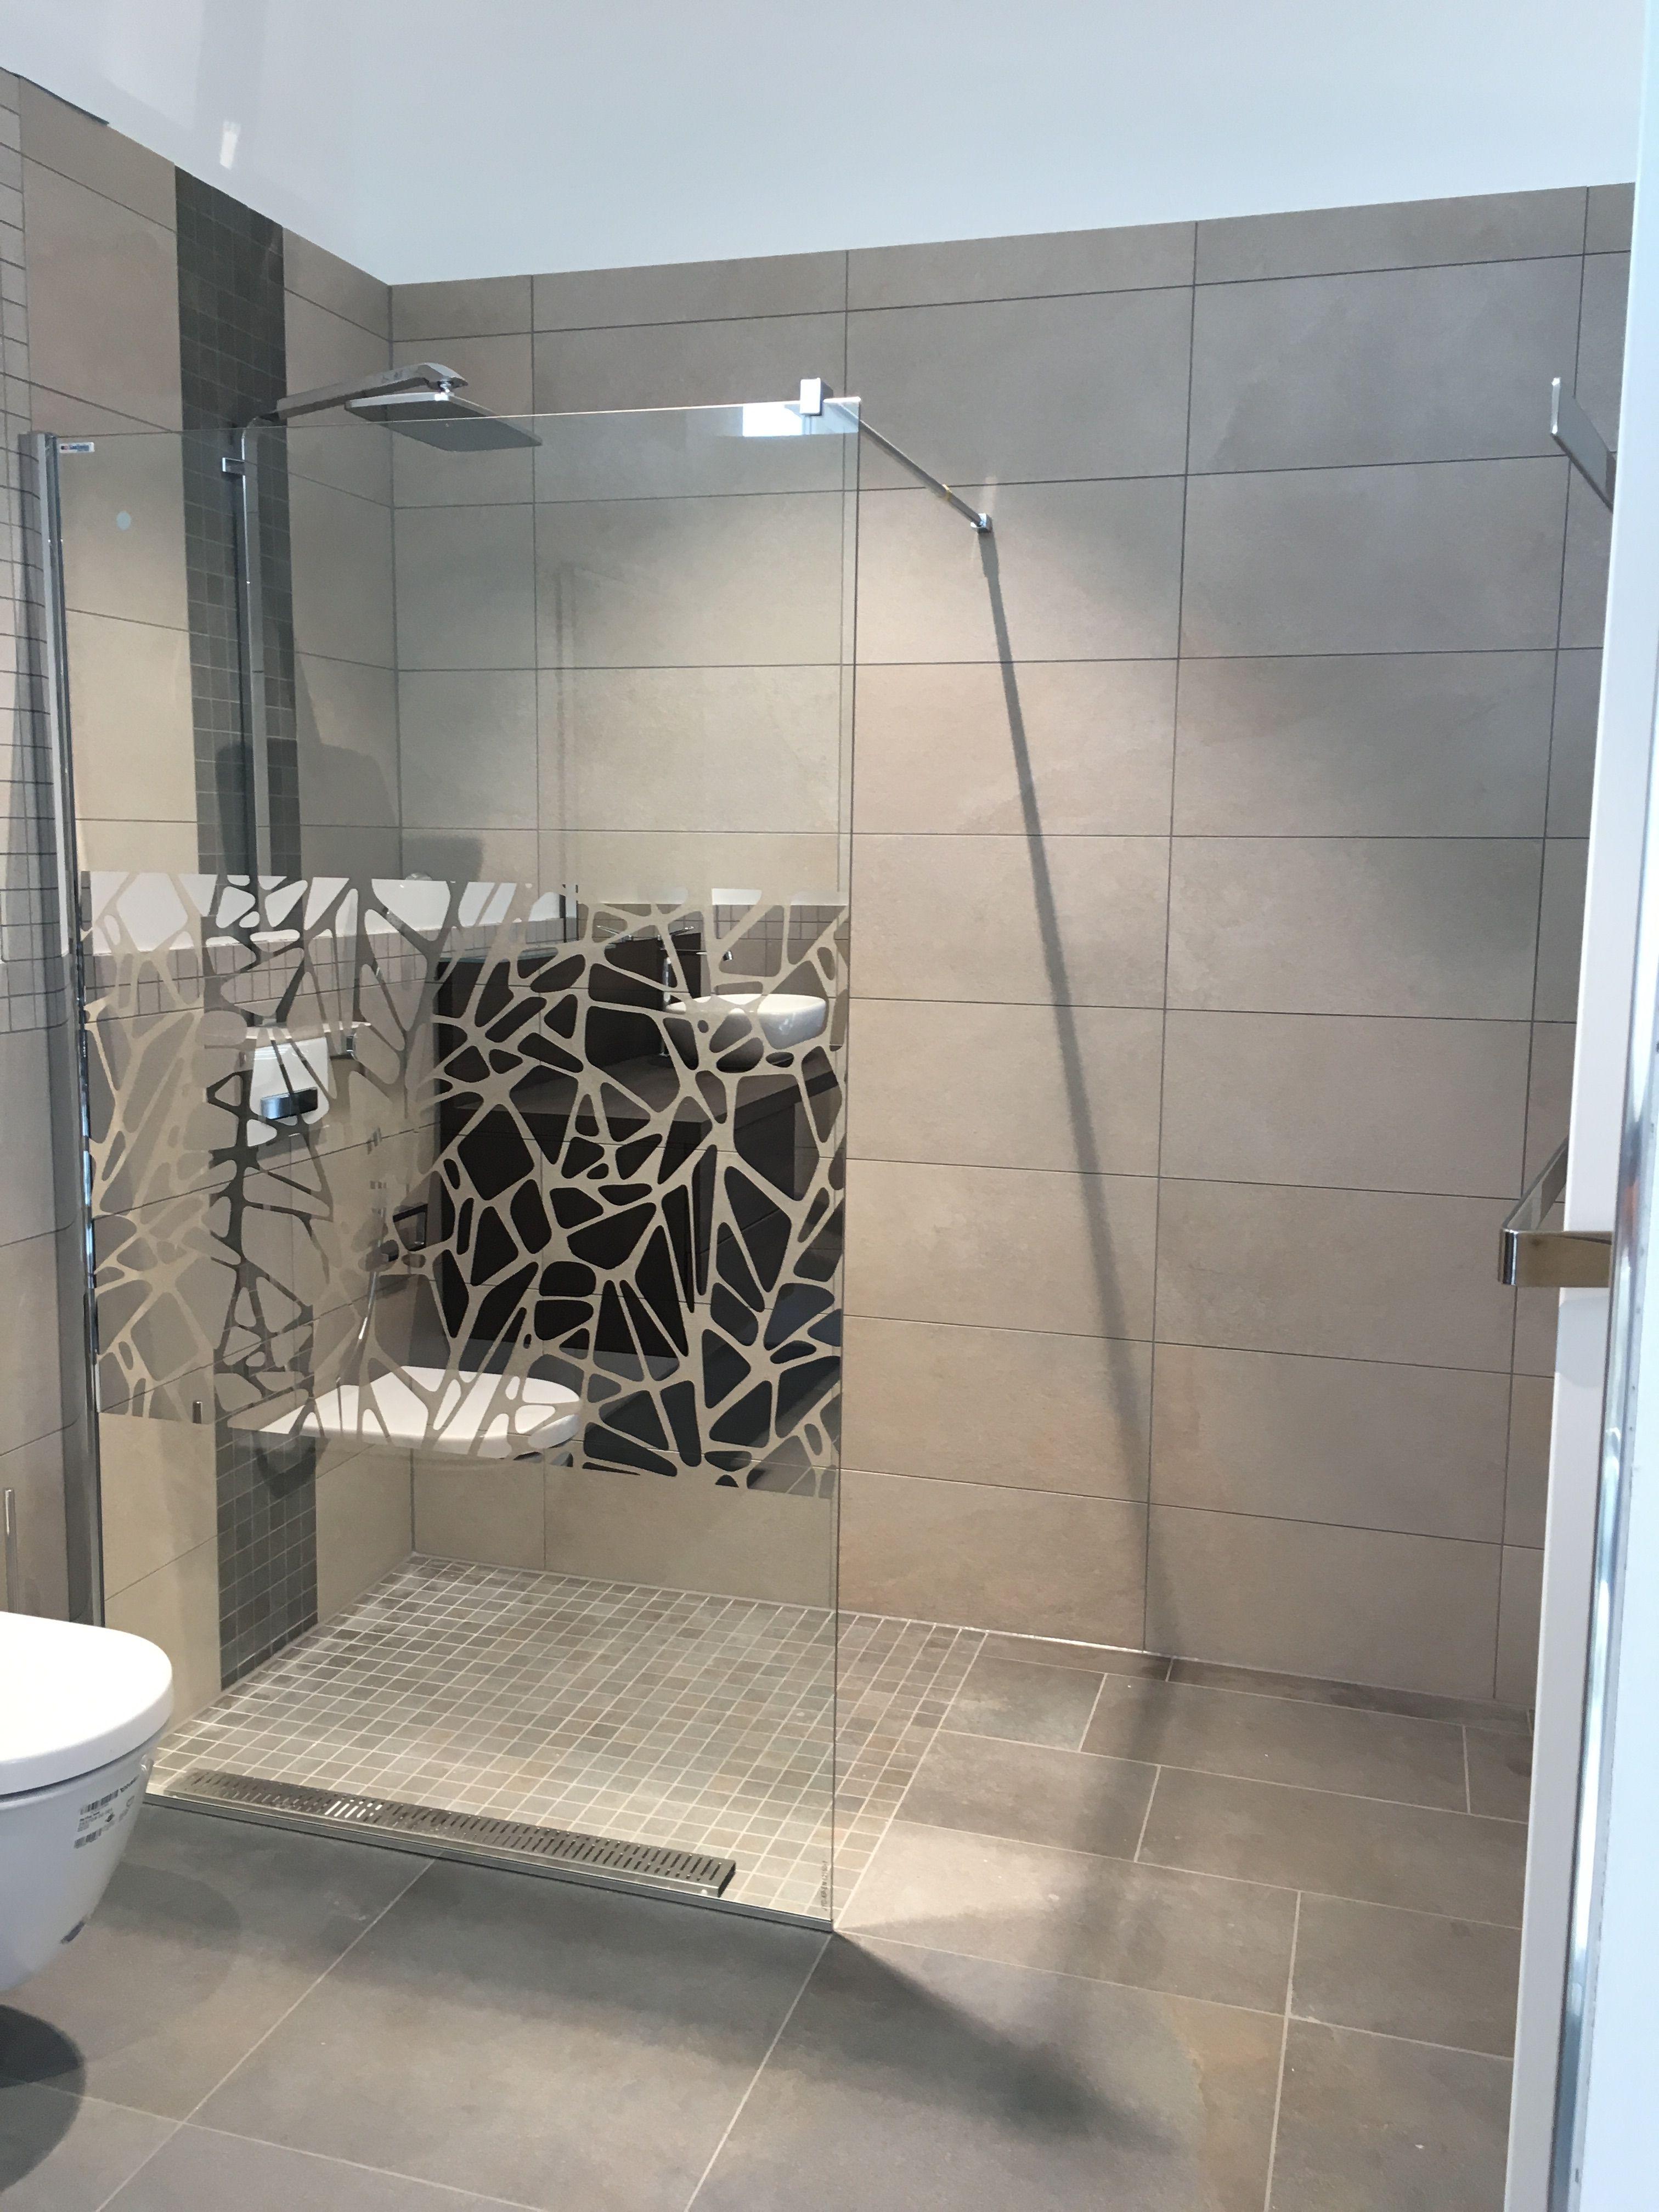 Bathroom shower stall